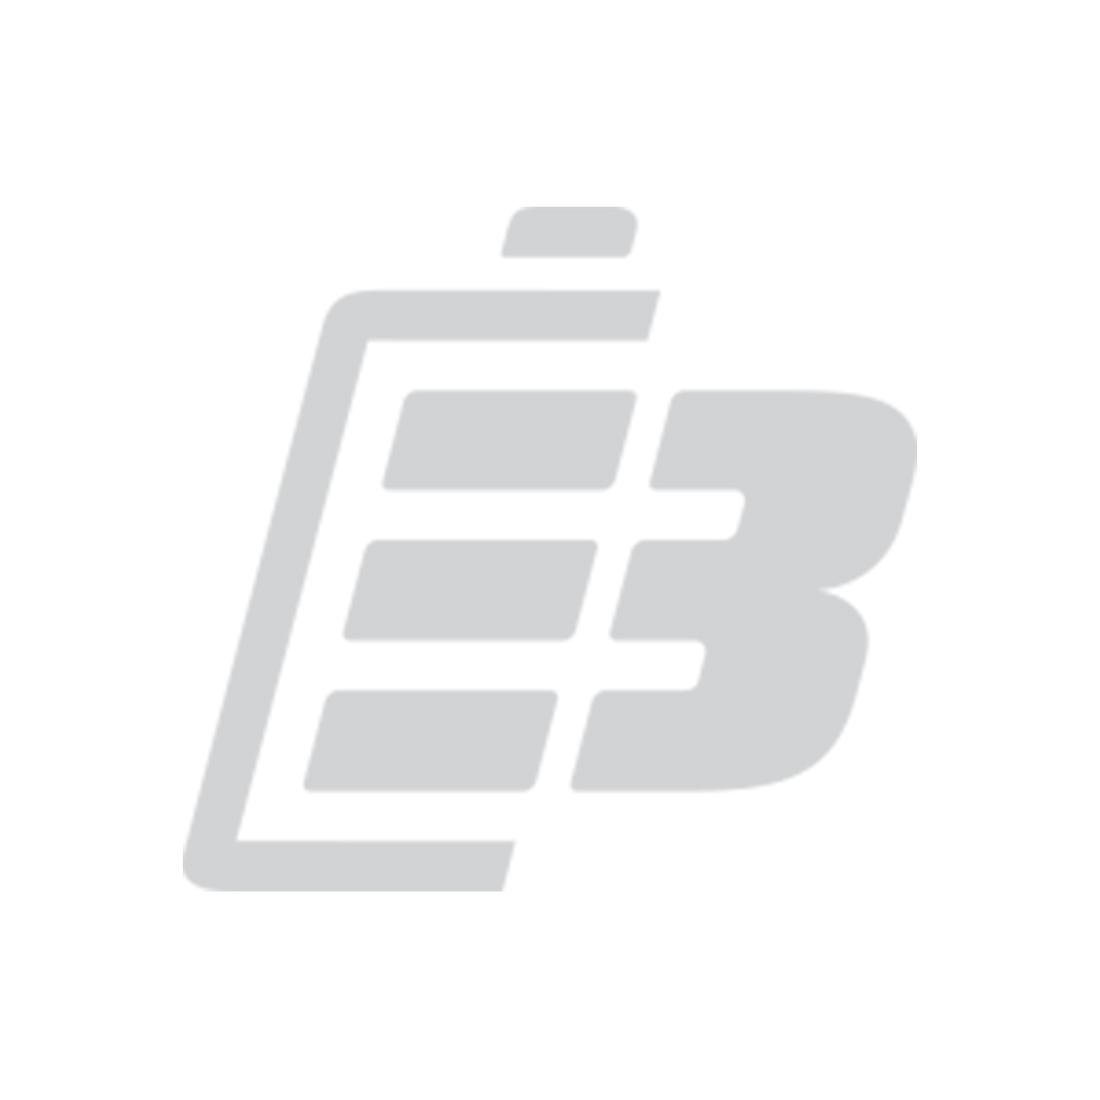 Laptop battery Toshiba Satellite C660 extended_1